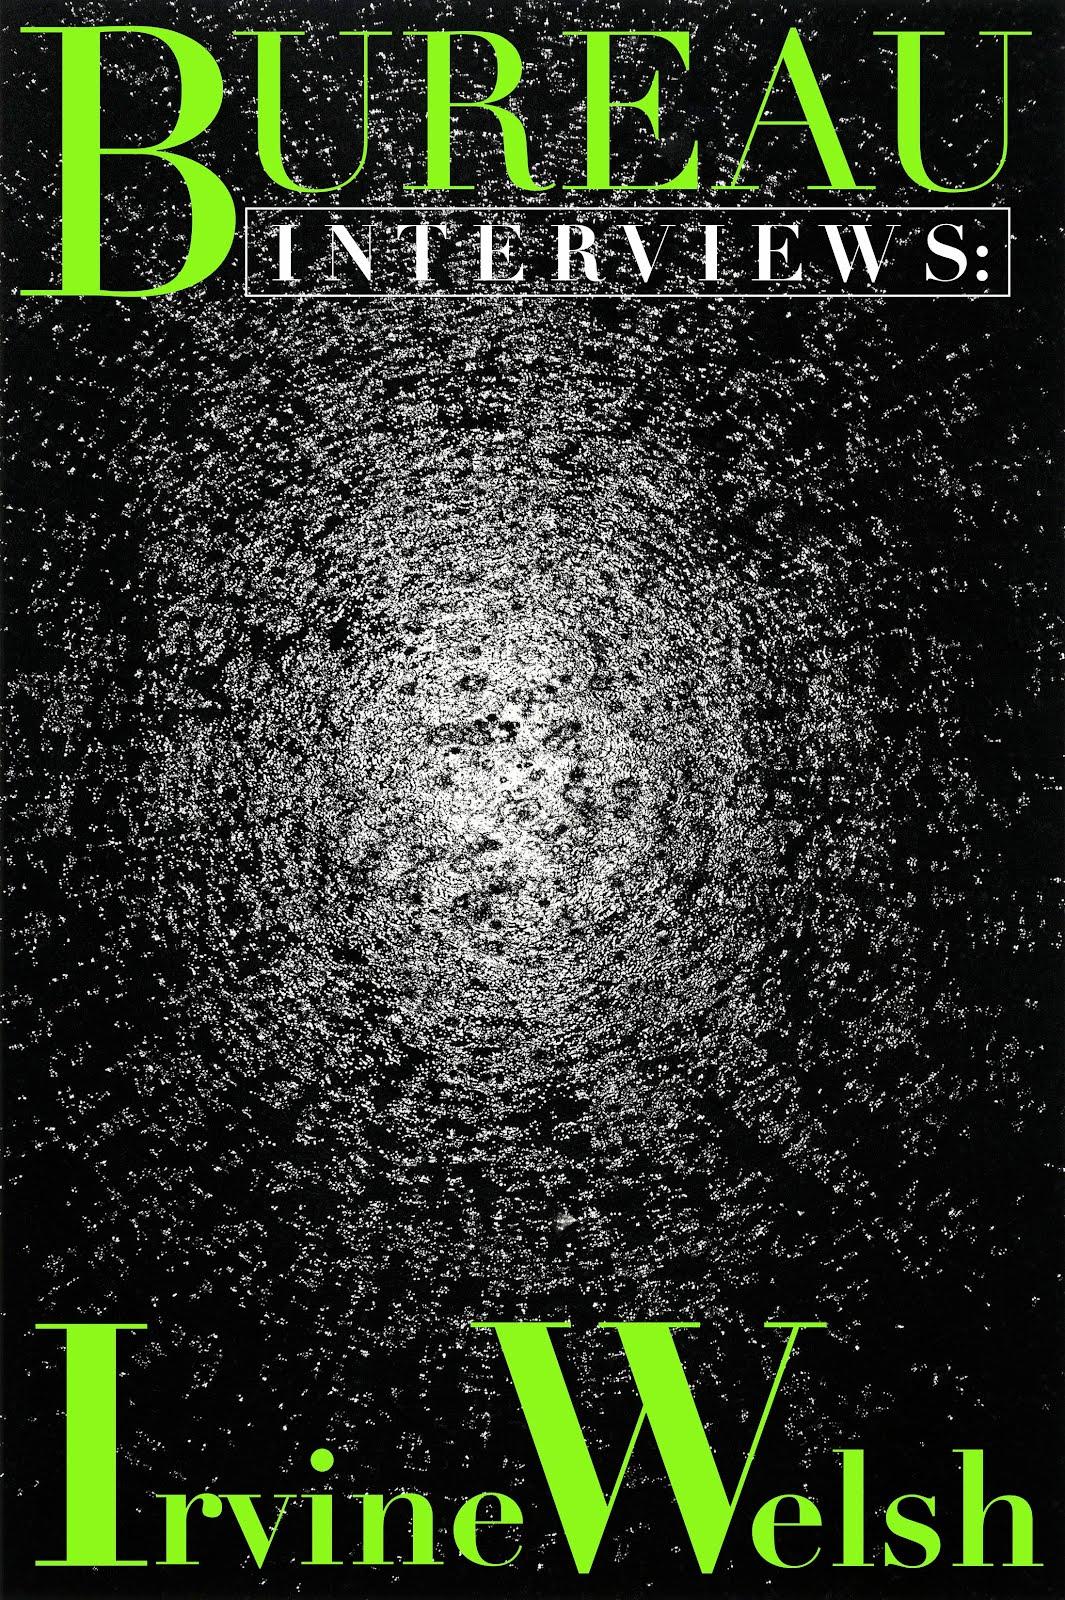 NEW LITERARY 2016 EDITION